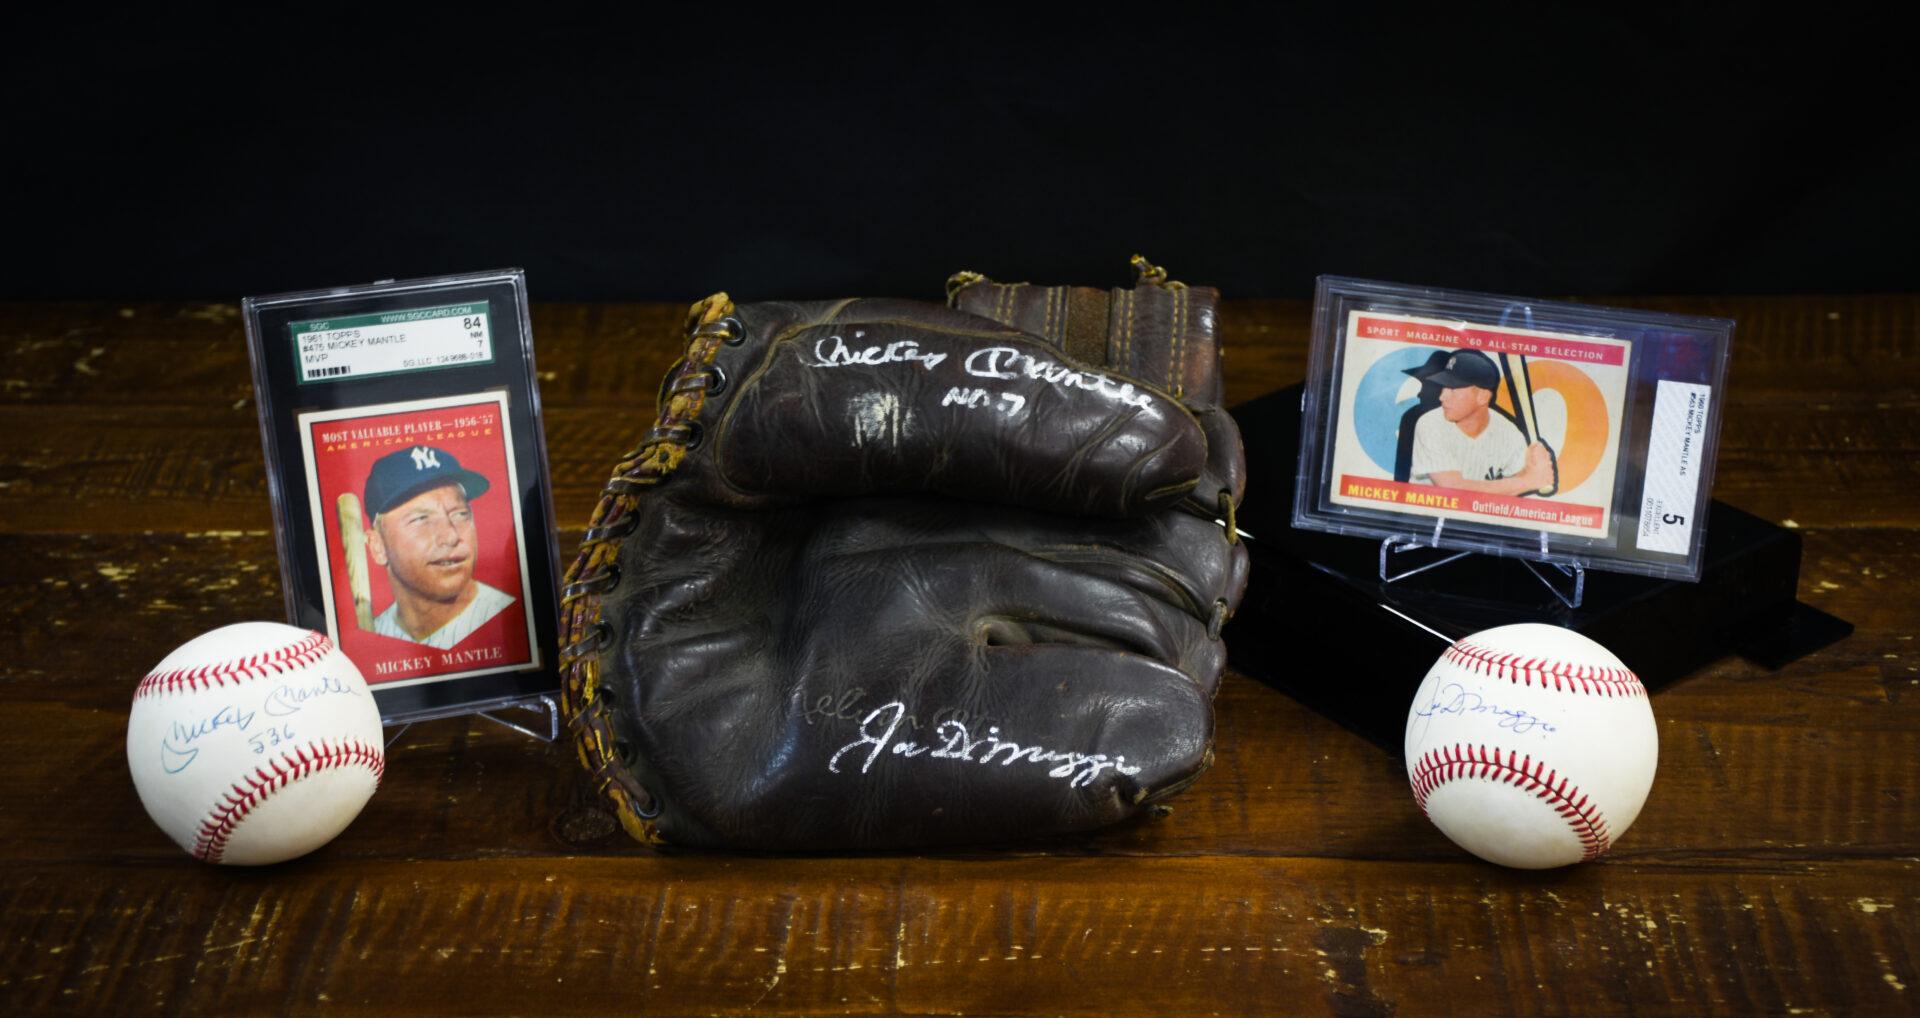 Baseball items of Mickey Mantle